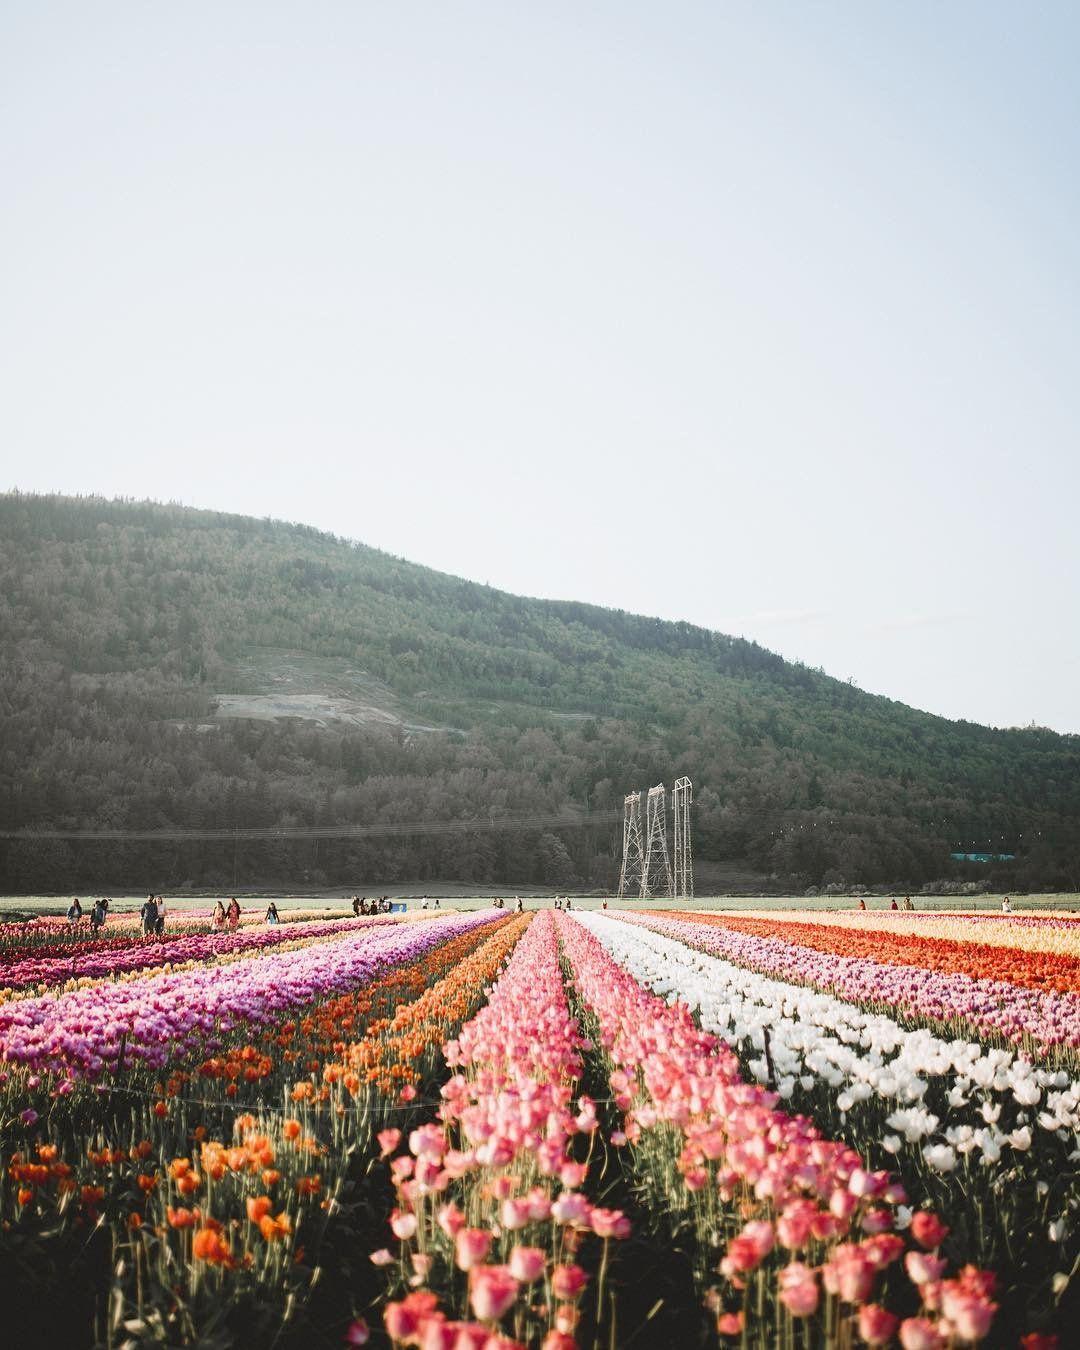 Tiffanytphung Landscape Photography Flower Aesthetic Wild Flowers